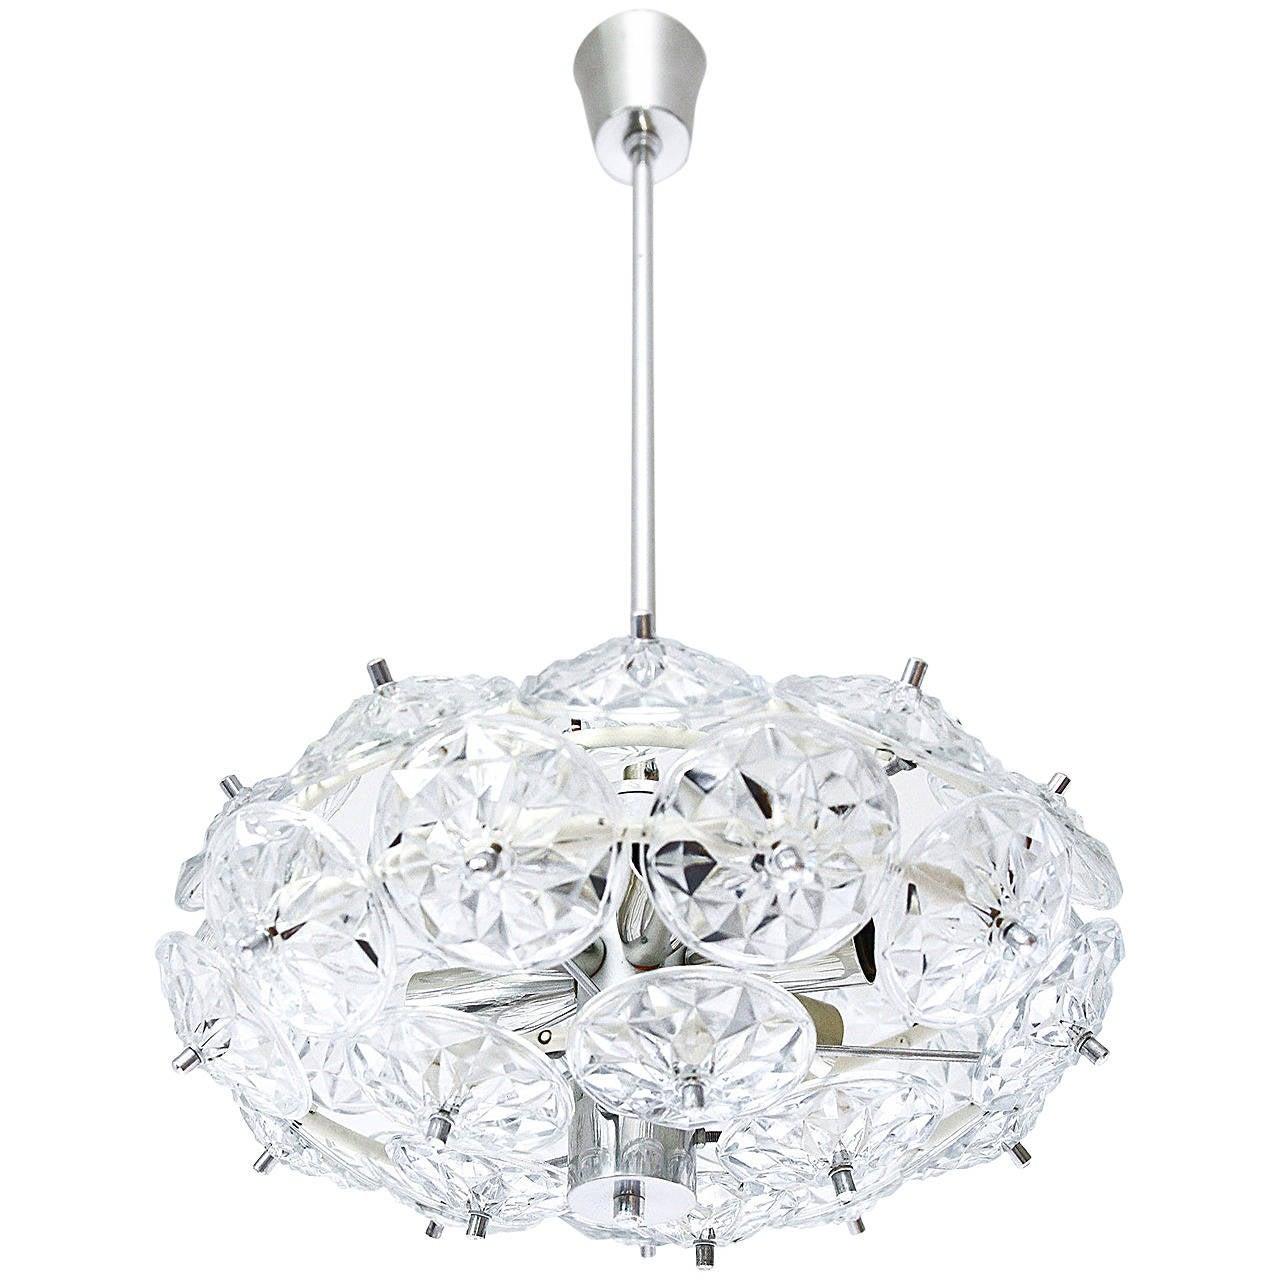 Sputnik Pendant Light Kinkeldey Style, Glass Chrome, 1960s